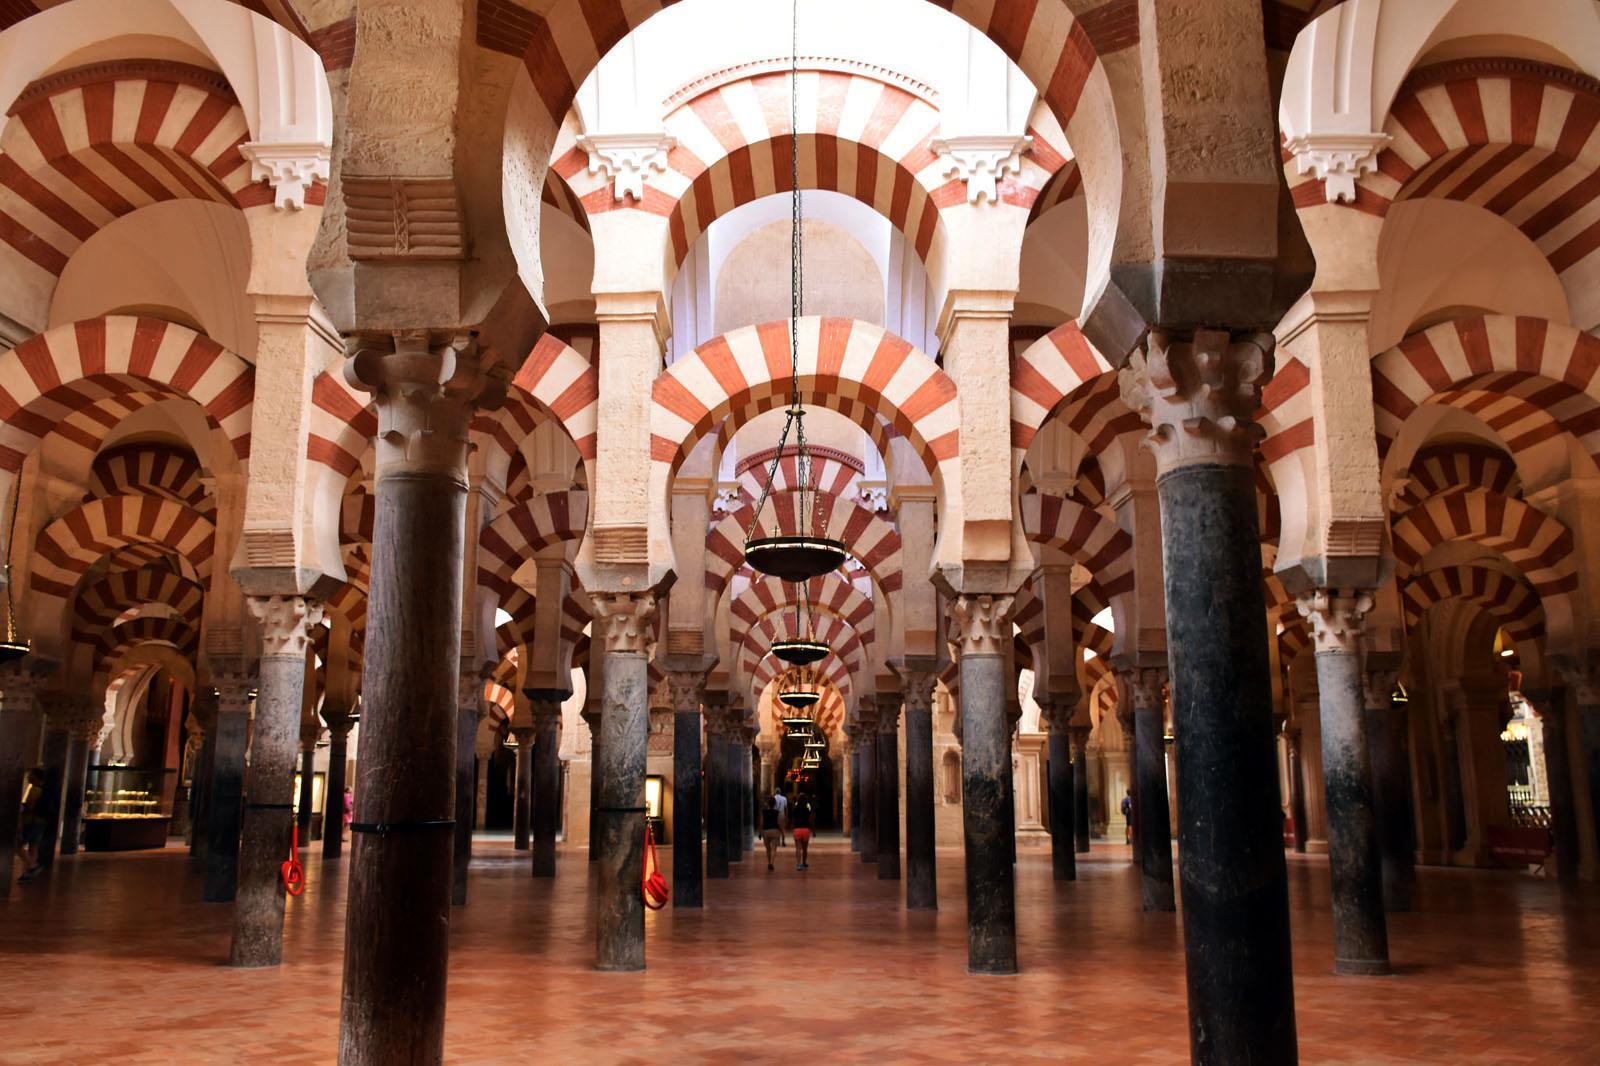 Guided-Tour-Mosque-of-Cordoba-and-Jewish-Quarter-1